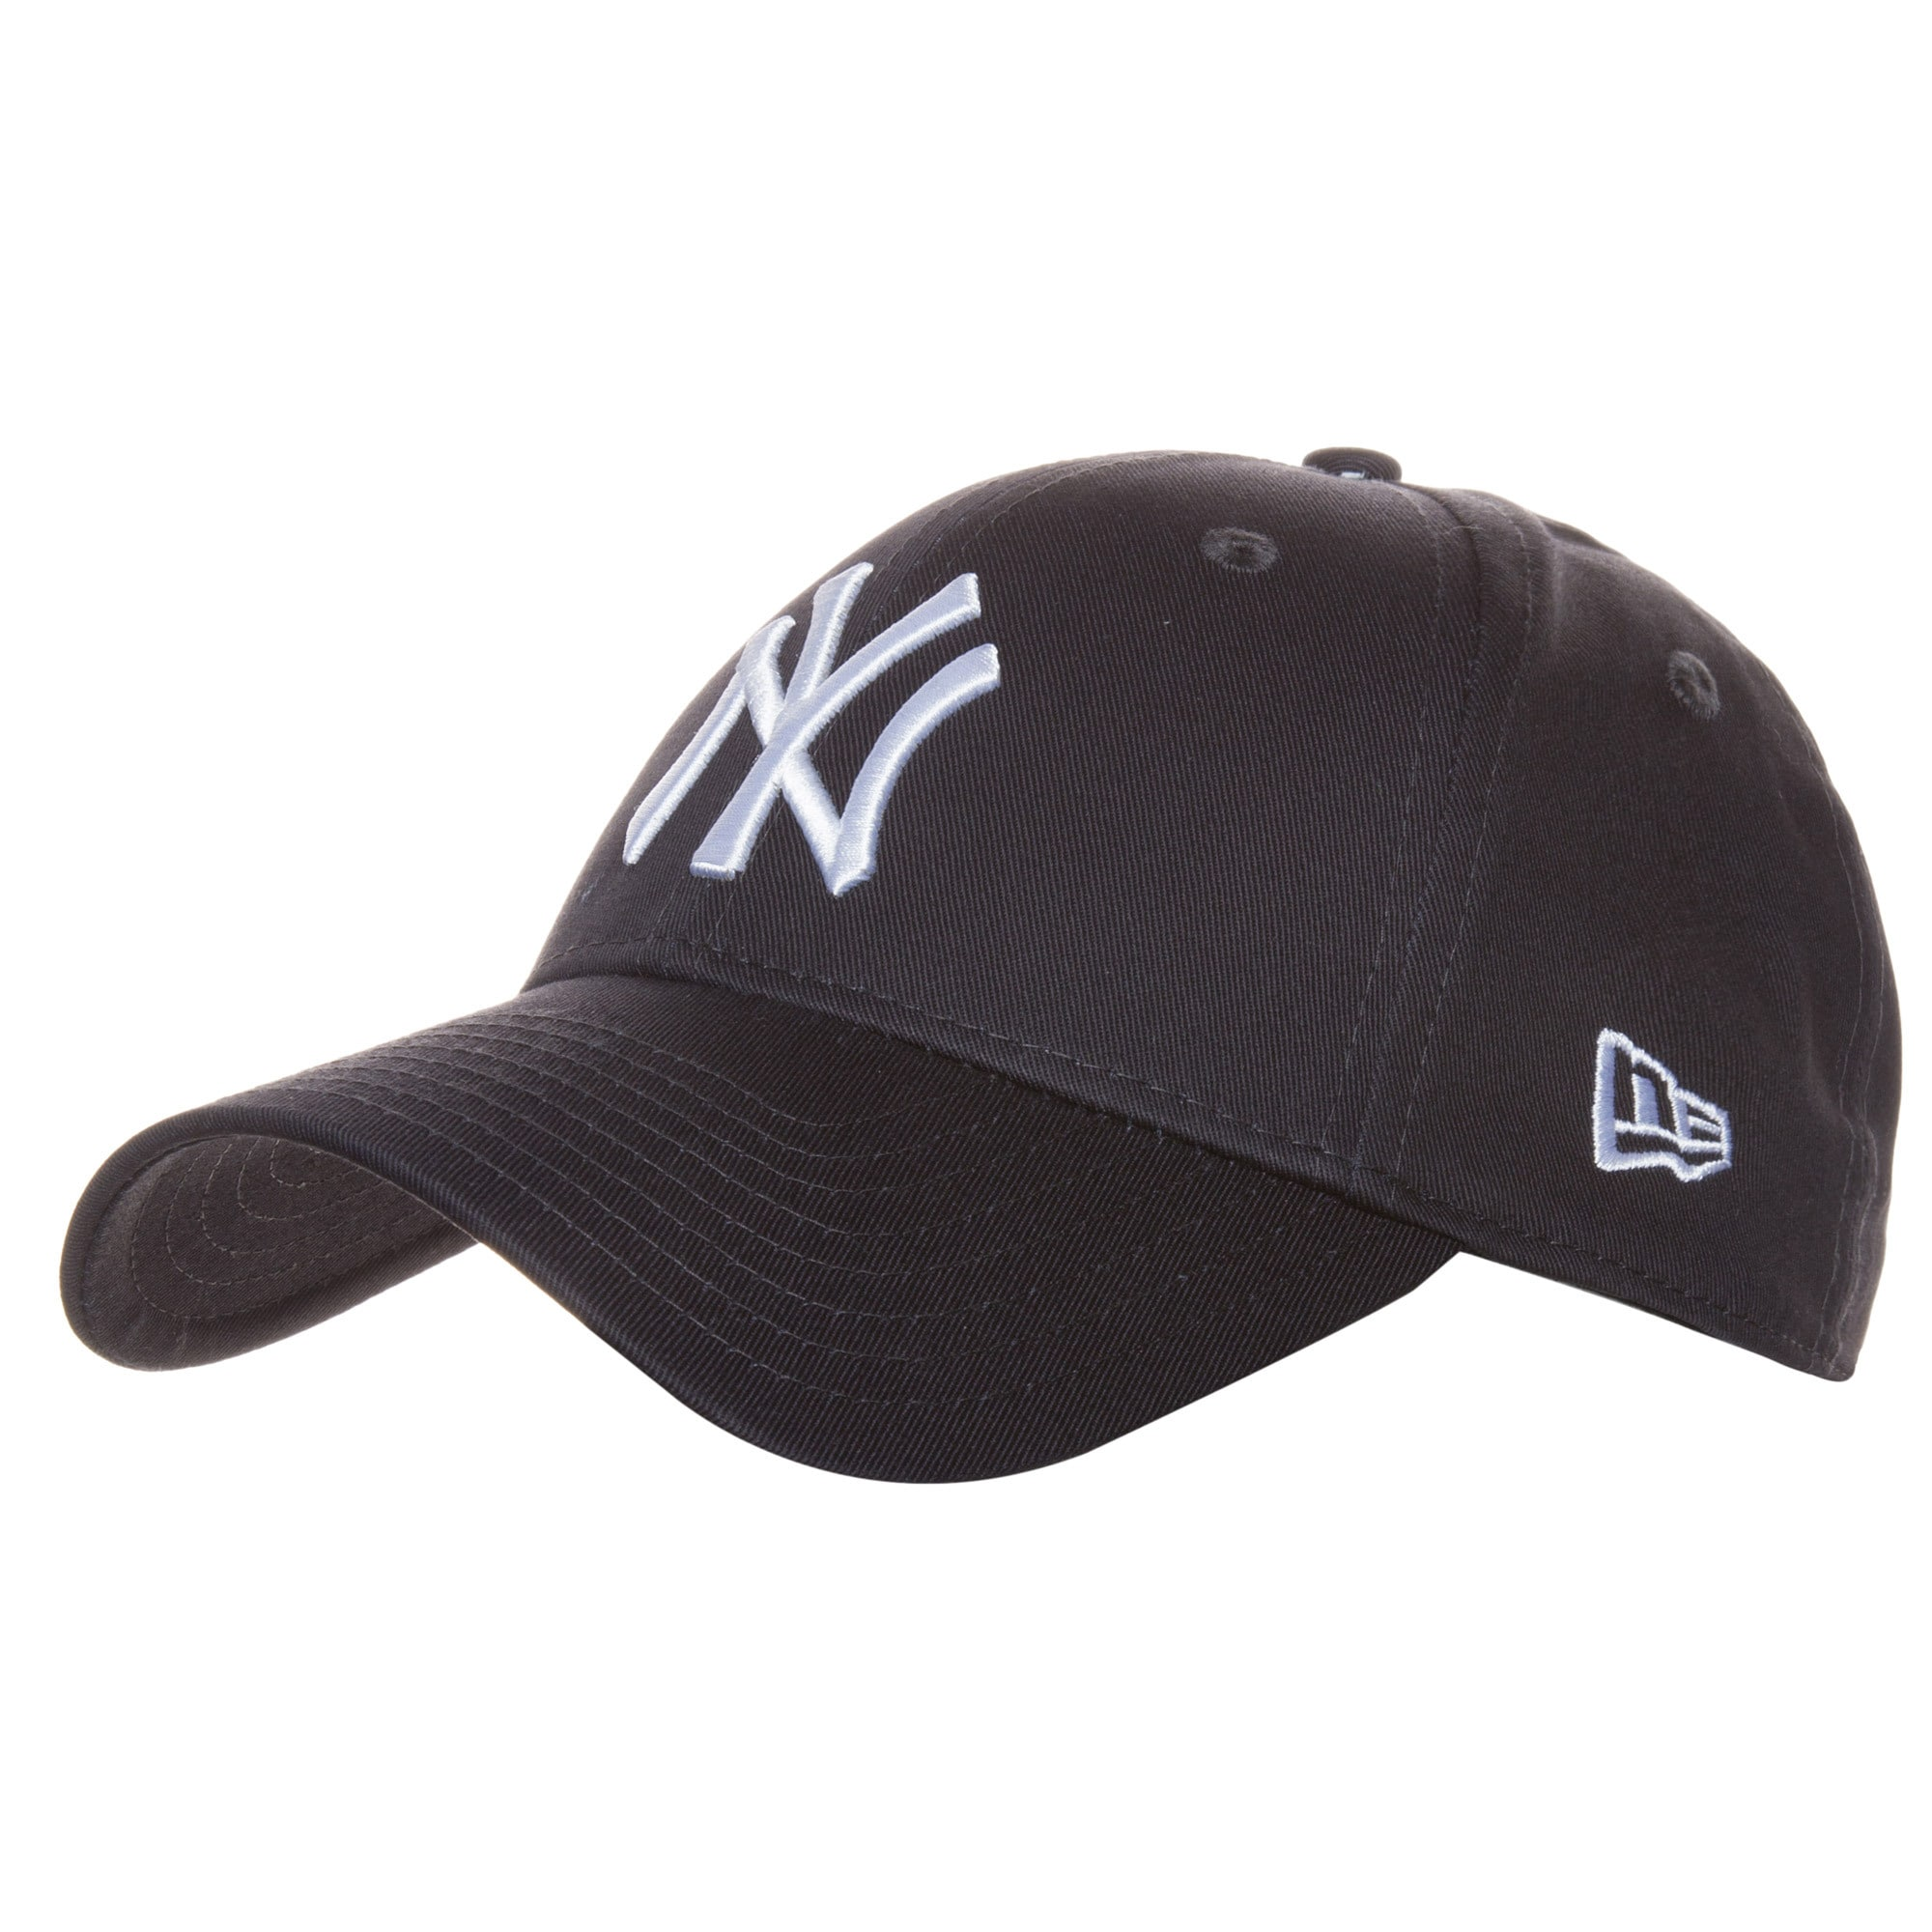 Kšiltovka 9Forty League Basic New York Yankees námořnická modř bílá NEW ERA